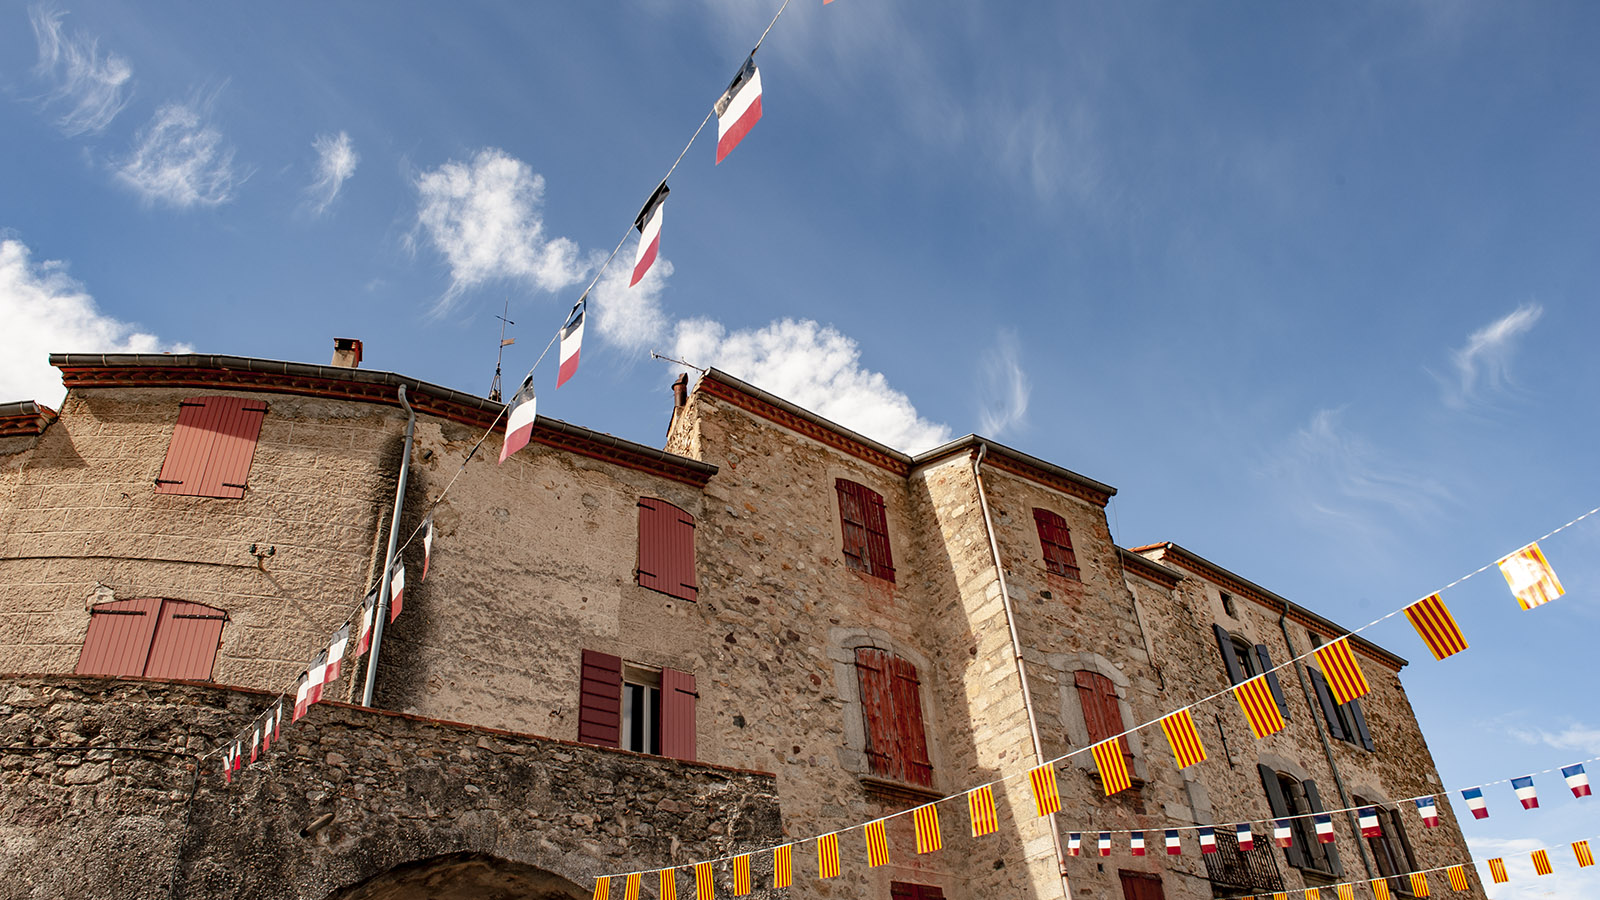 Die Altstadt von Saint-Laurent-de-Cerdans. Foto: Hilke Maunder